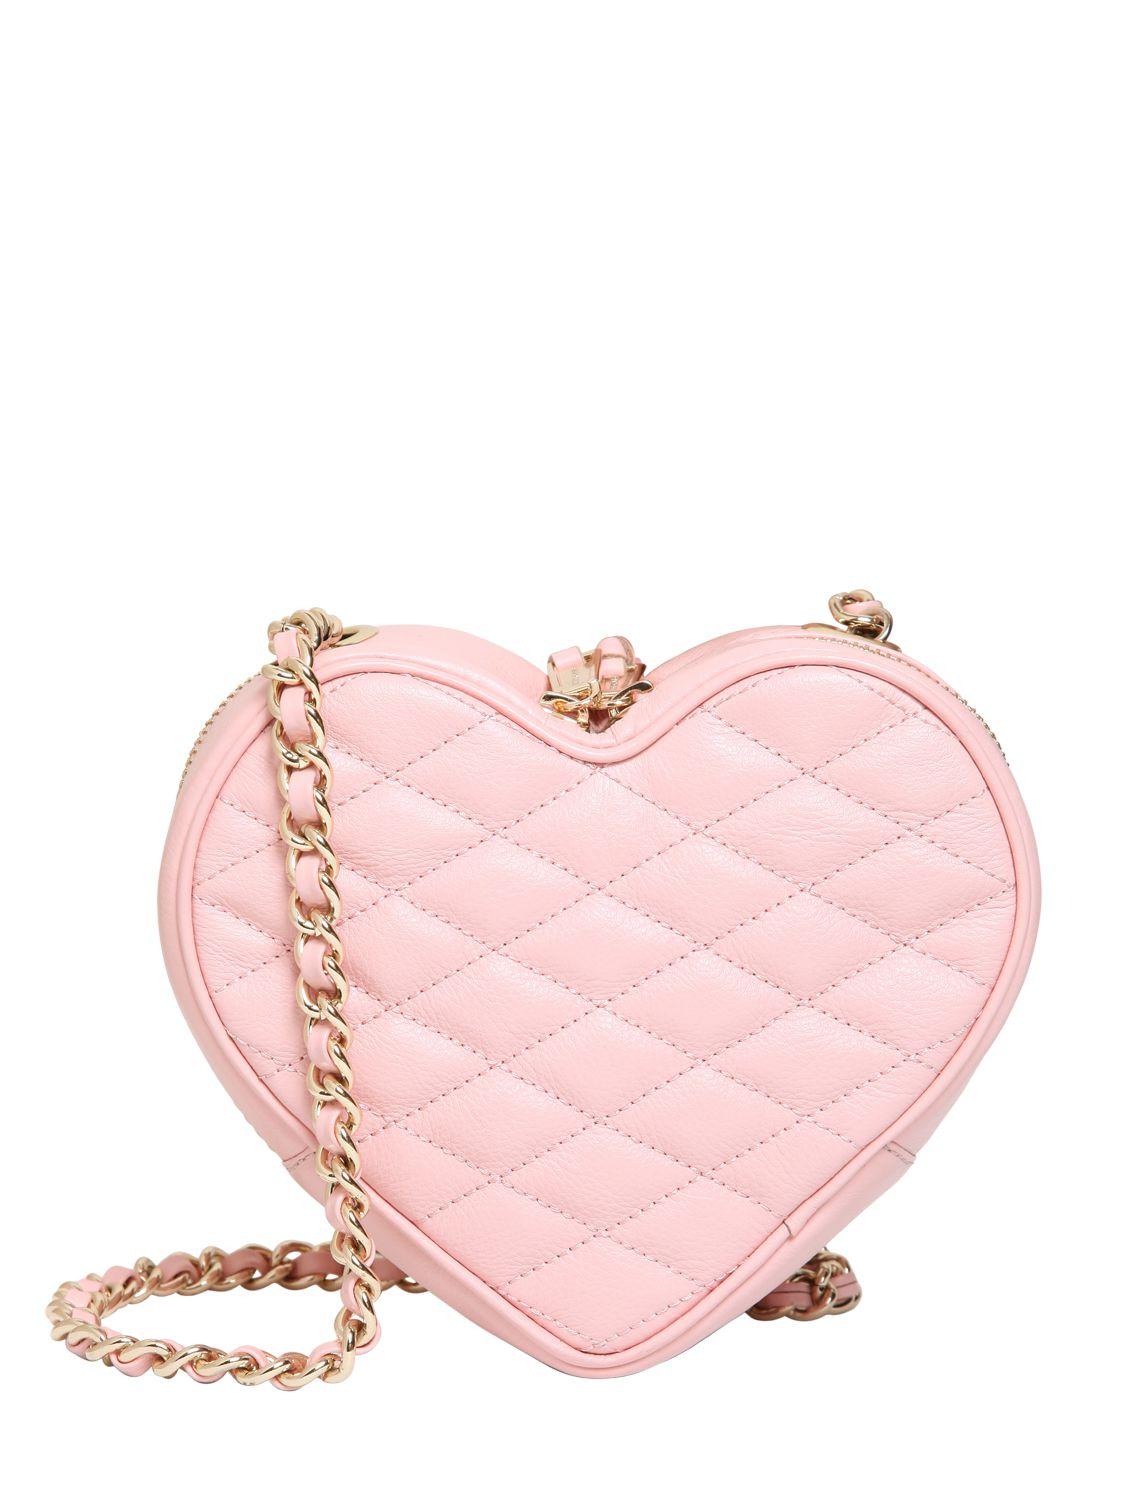 Rebecca Minkoff Heart Quilted Leather Shoulder Bag In Pink